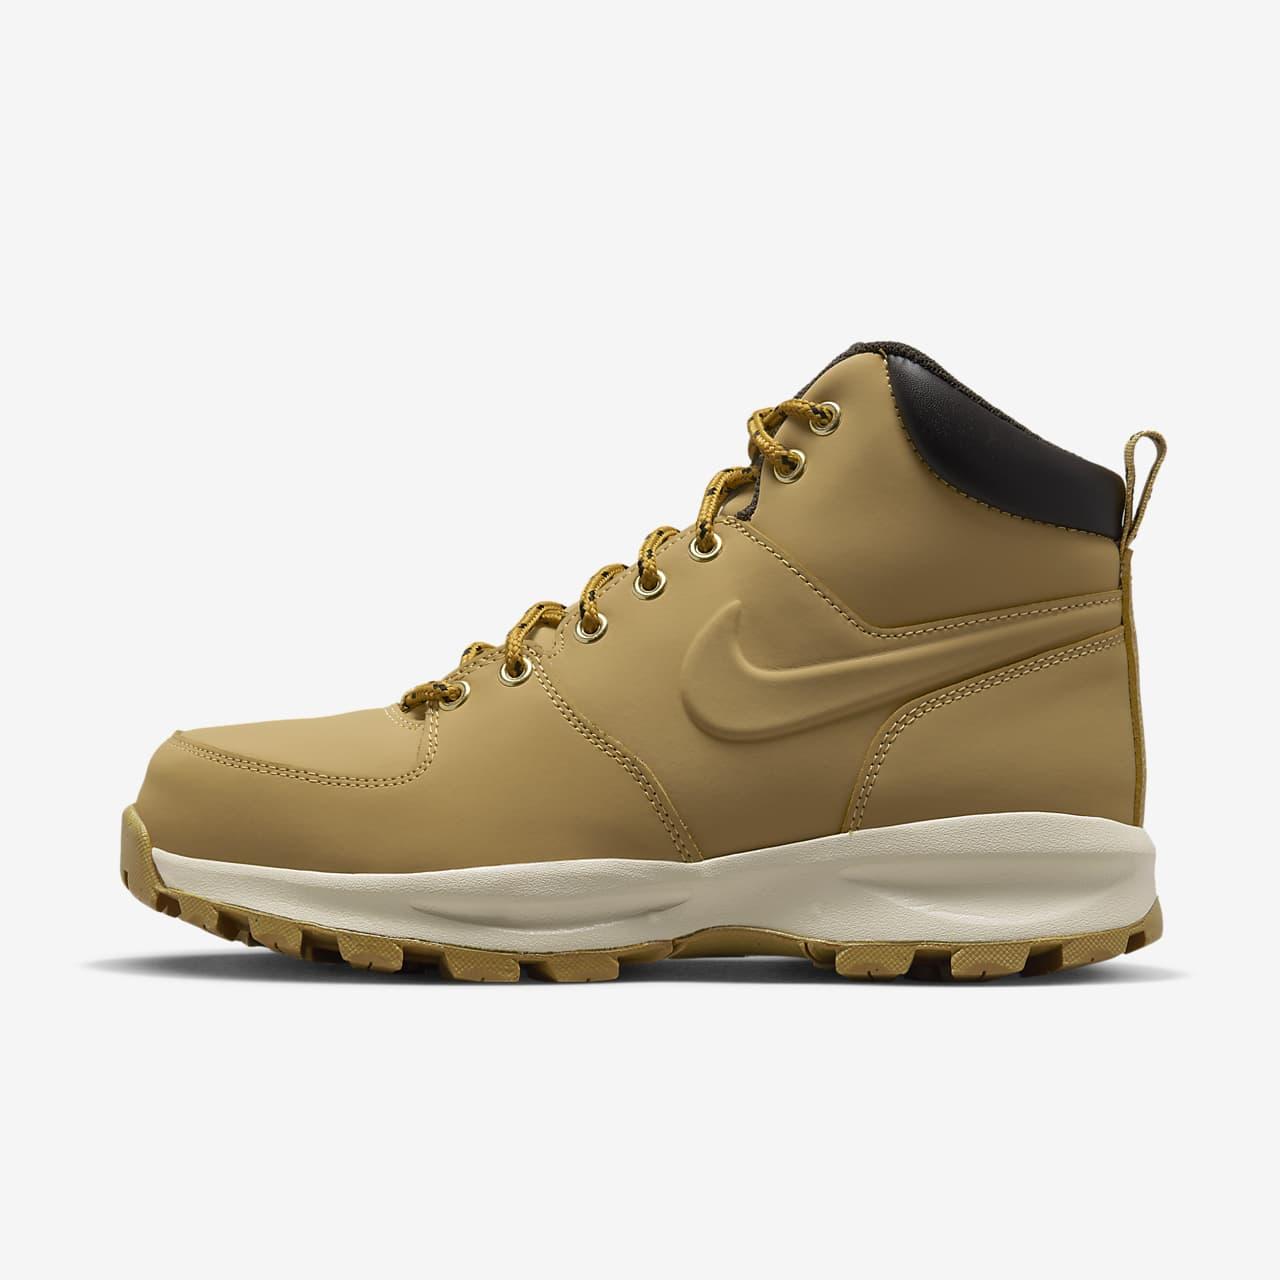 Nike Manoa Herenboots